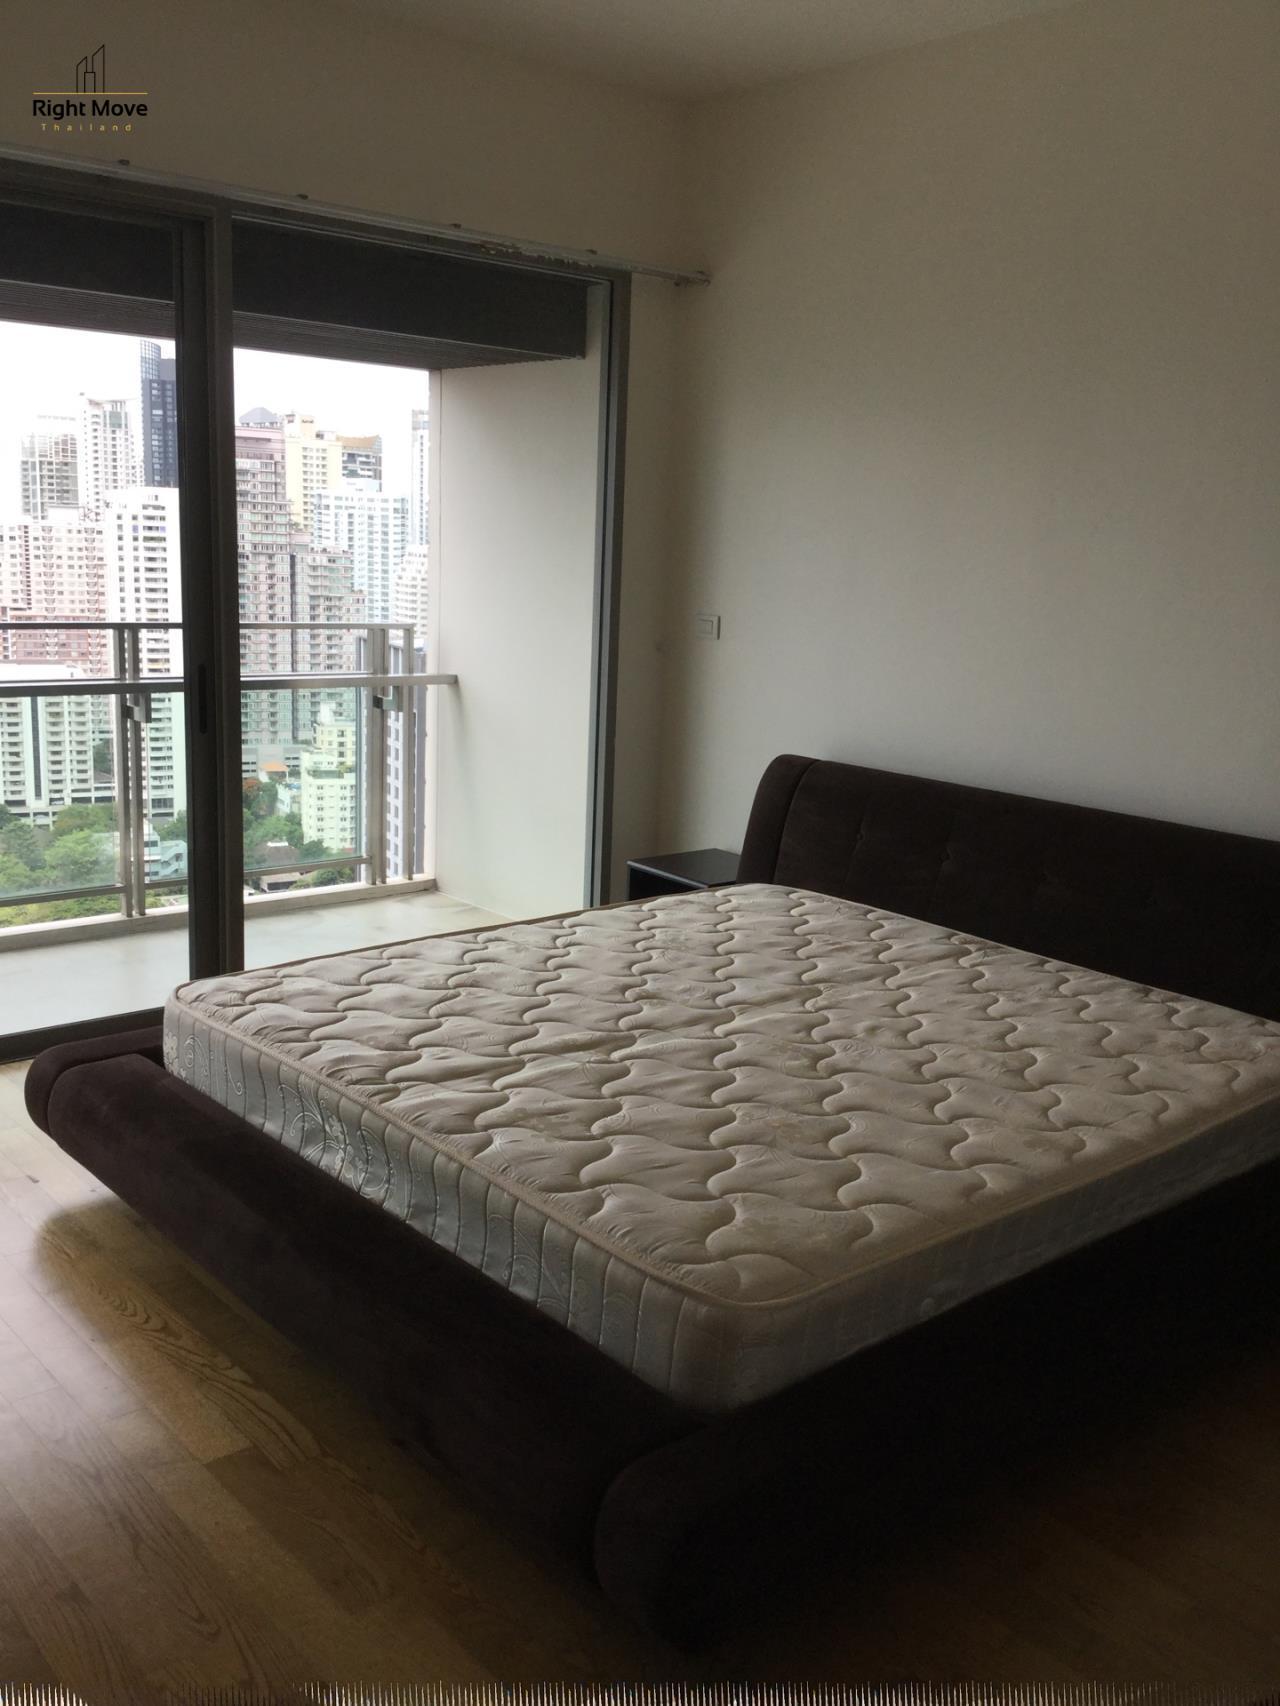 Right Move Thailand Agency's CA5486 Madison Condominium For Rent 90,000 THB - 3 Bedrooms - 160 sqm. 7